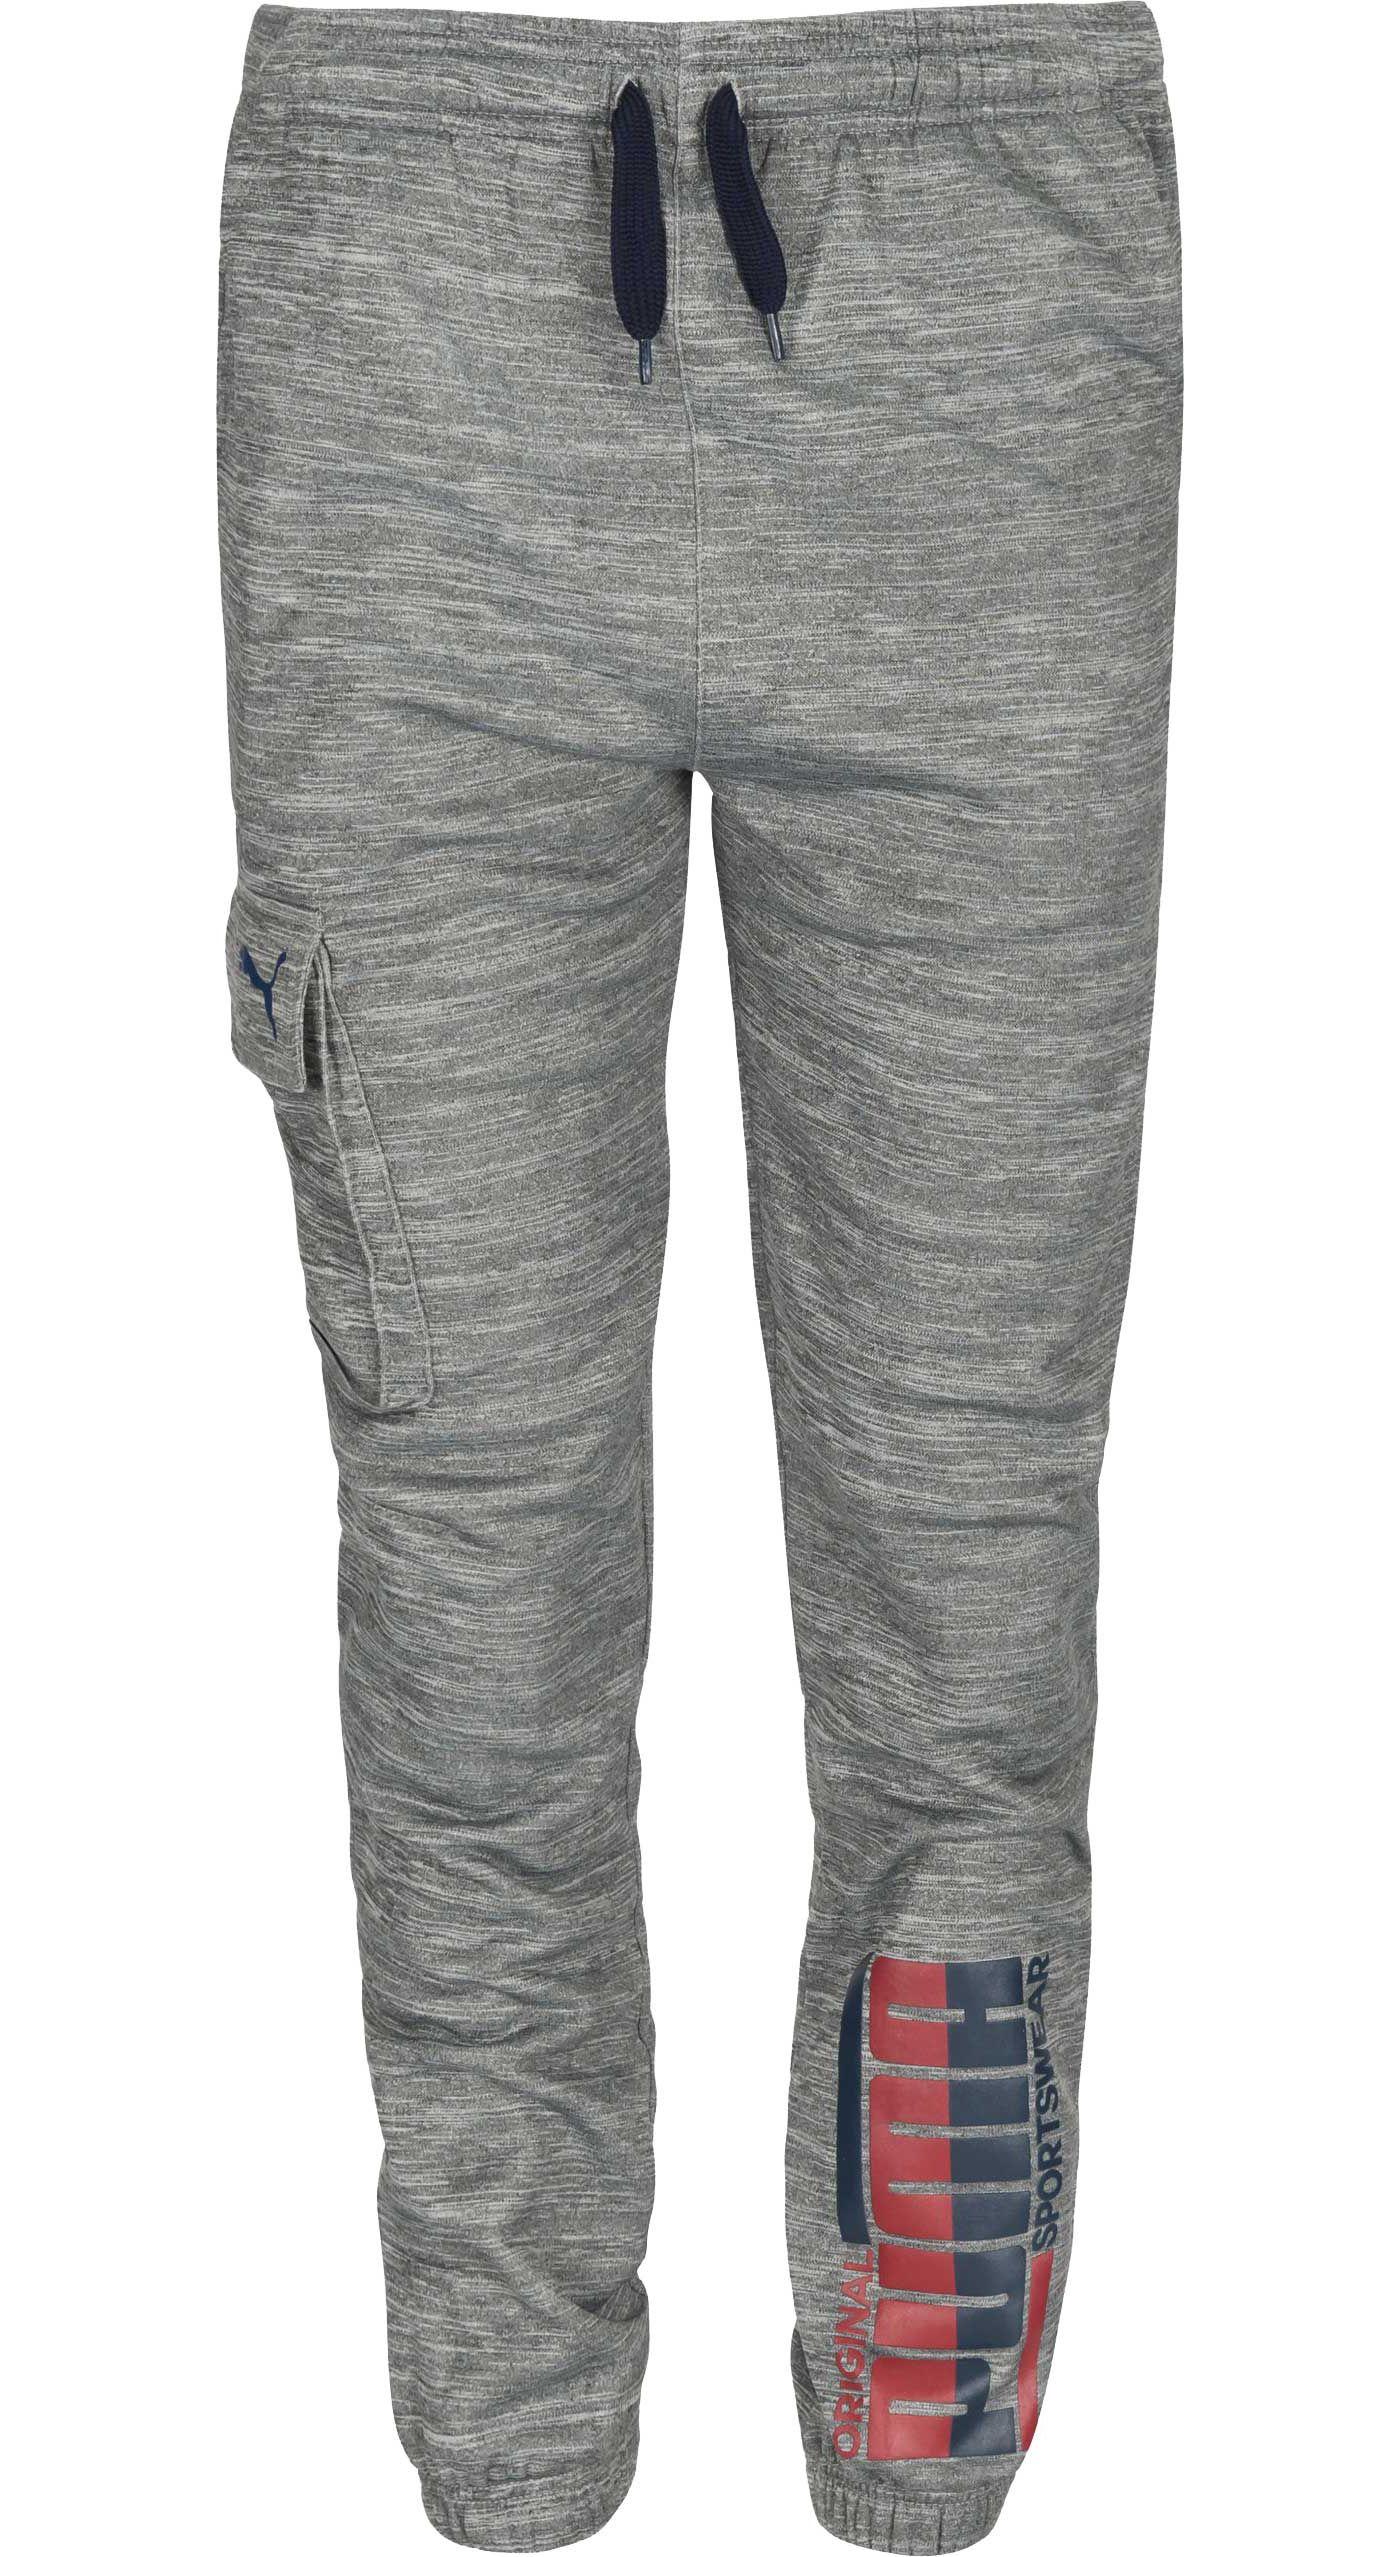 PUMA Boys' Cargo Pocket Tech Fleece Jogger Pants